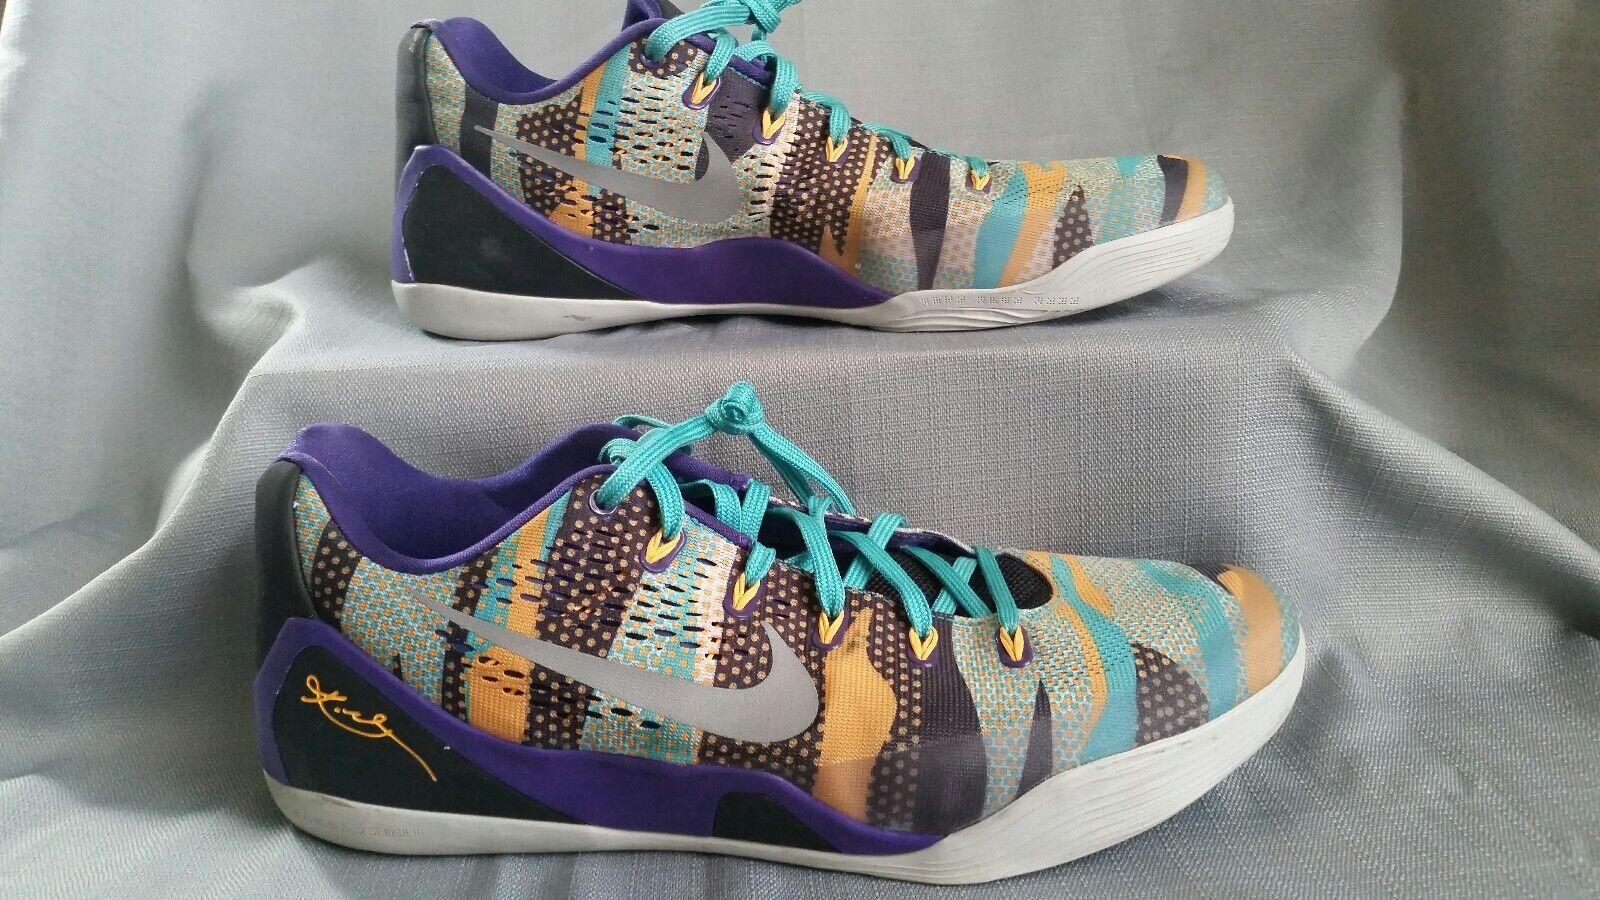 RARE Nike Kobe 9 IX Pop Art Camo Purple Gray Atomic Mango sz 14 646701-508